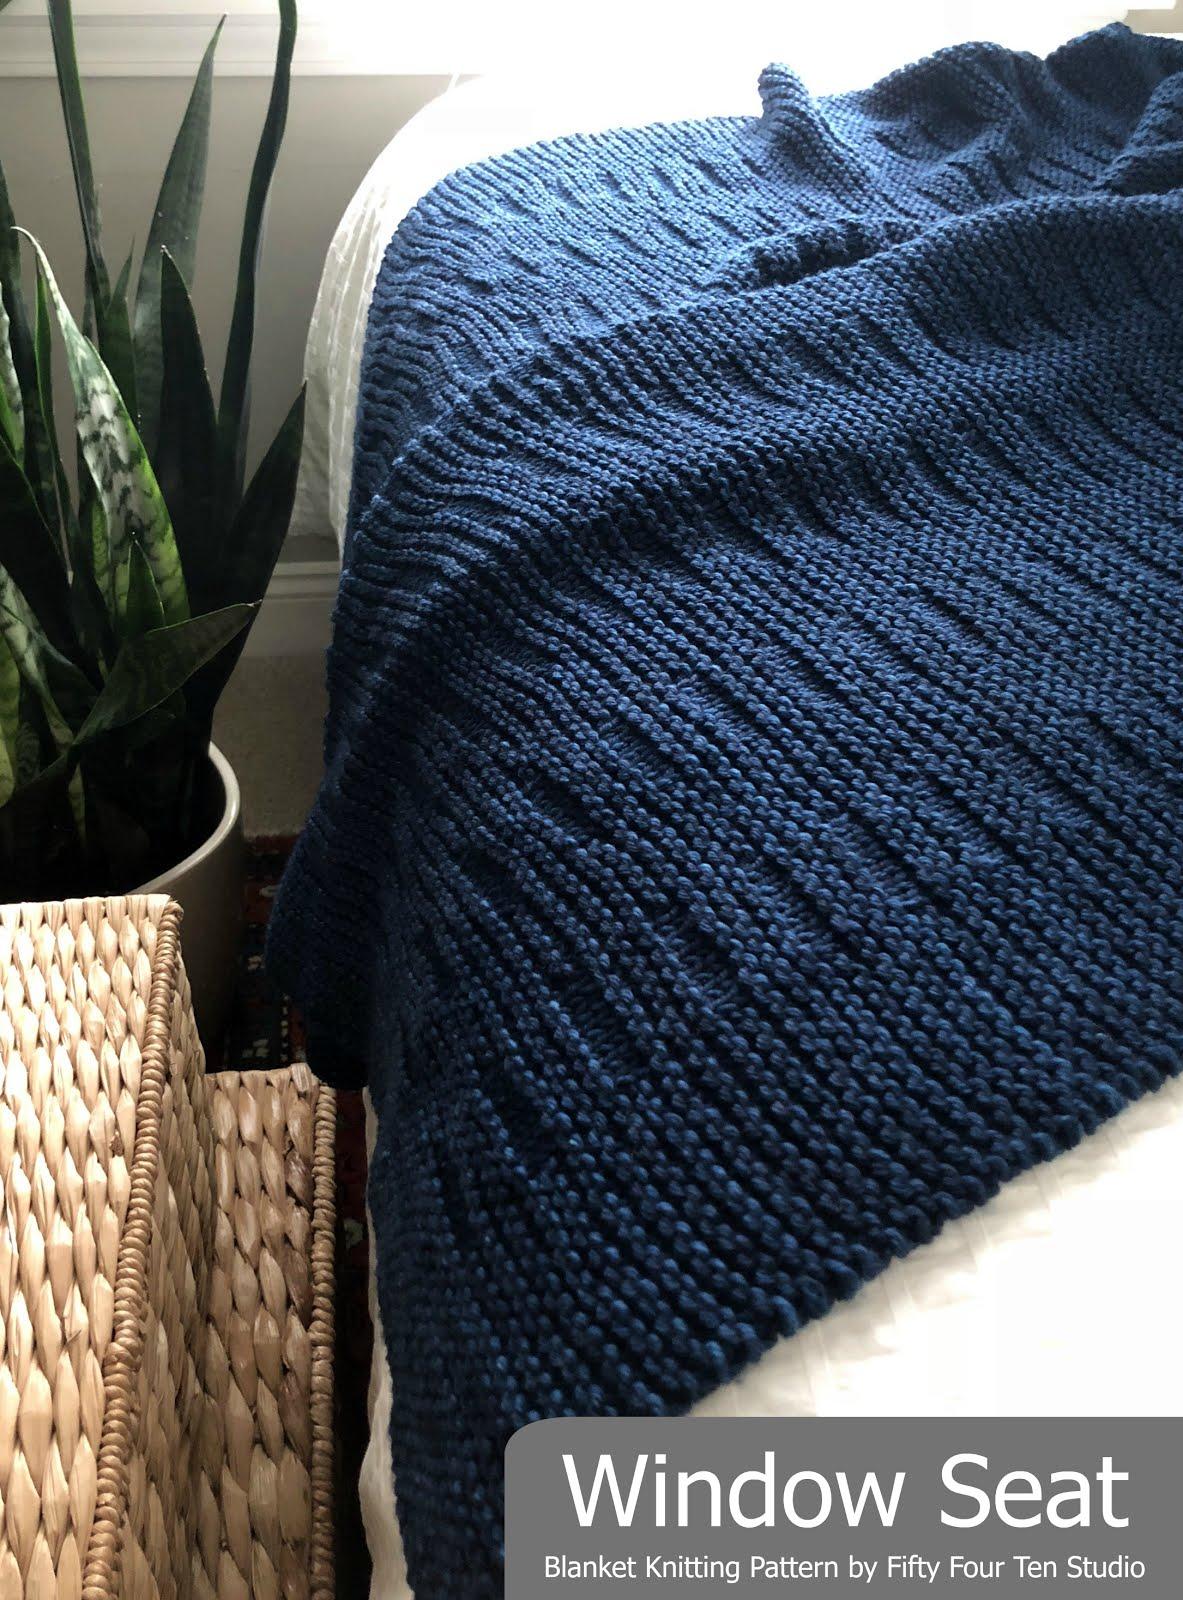 Window Seat Blanket